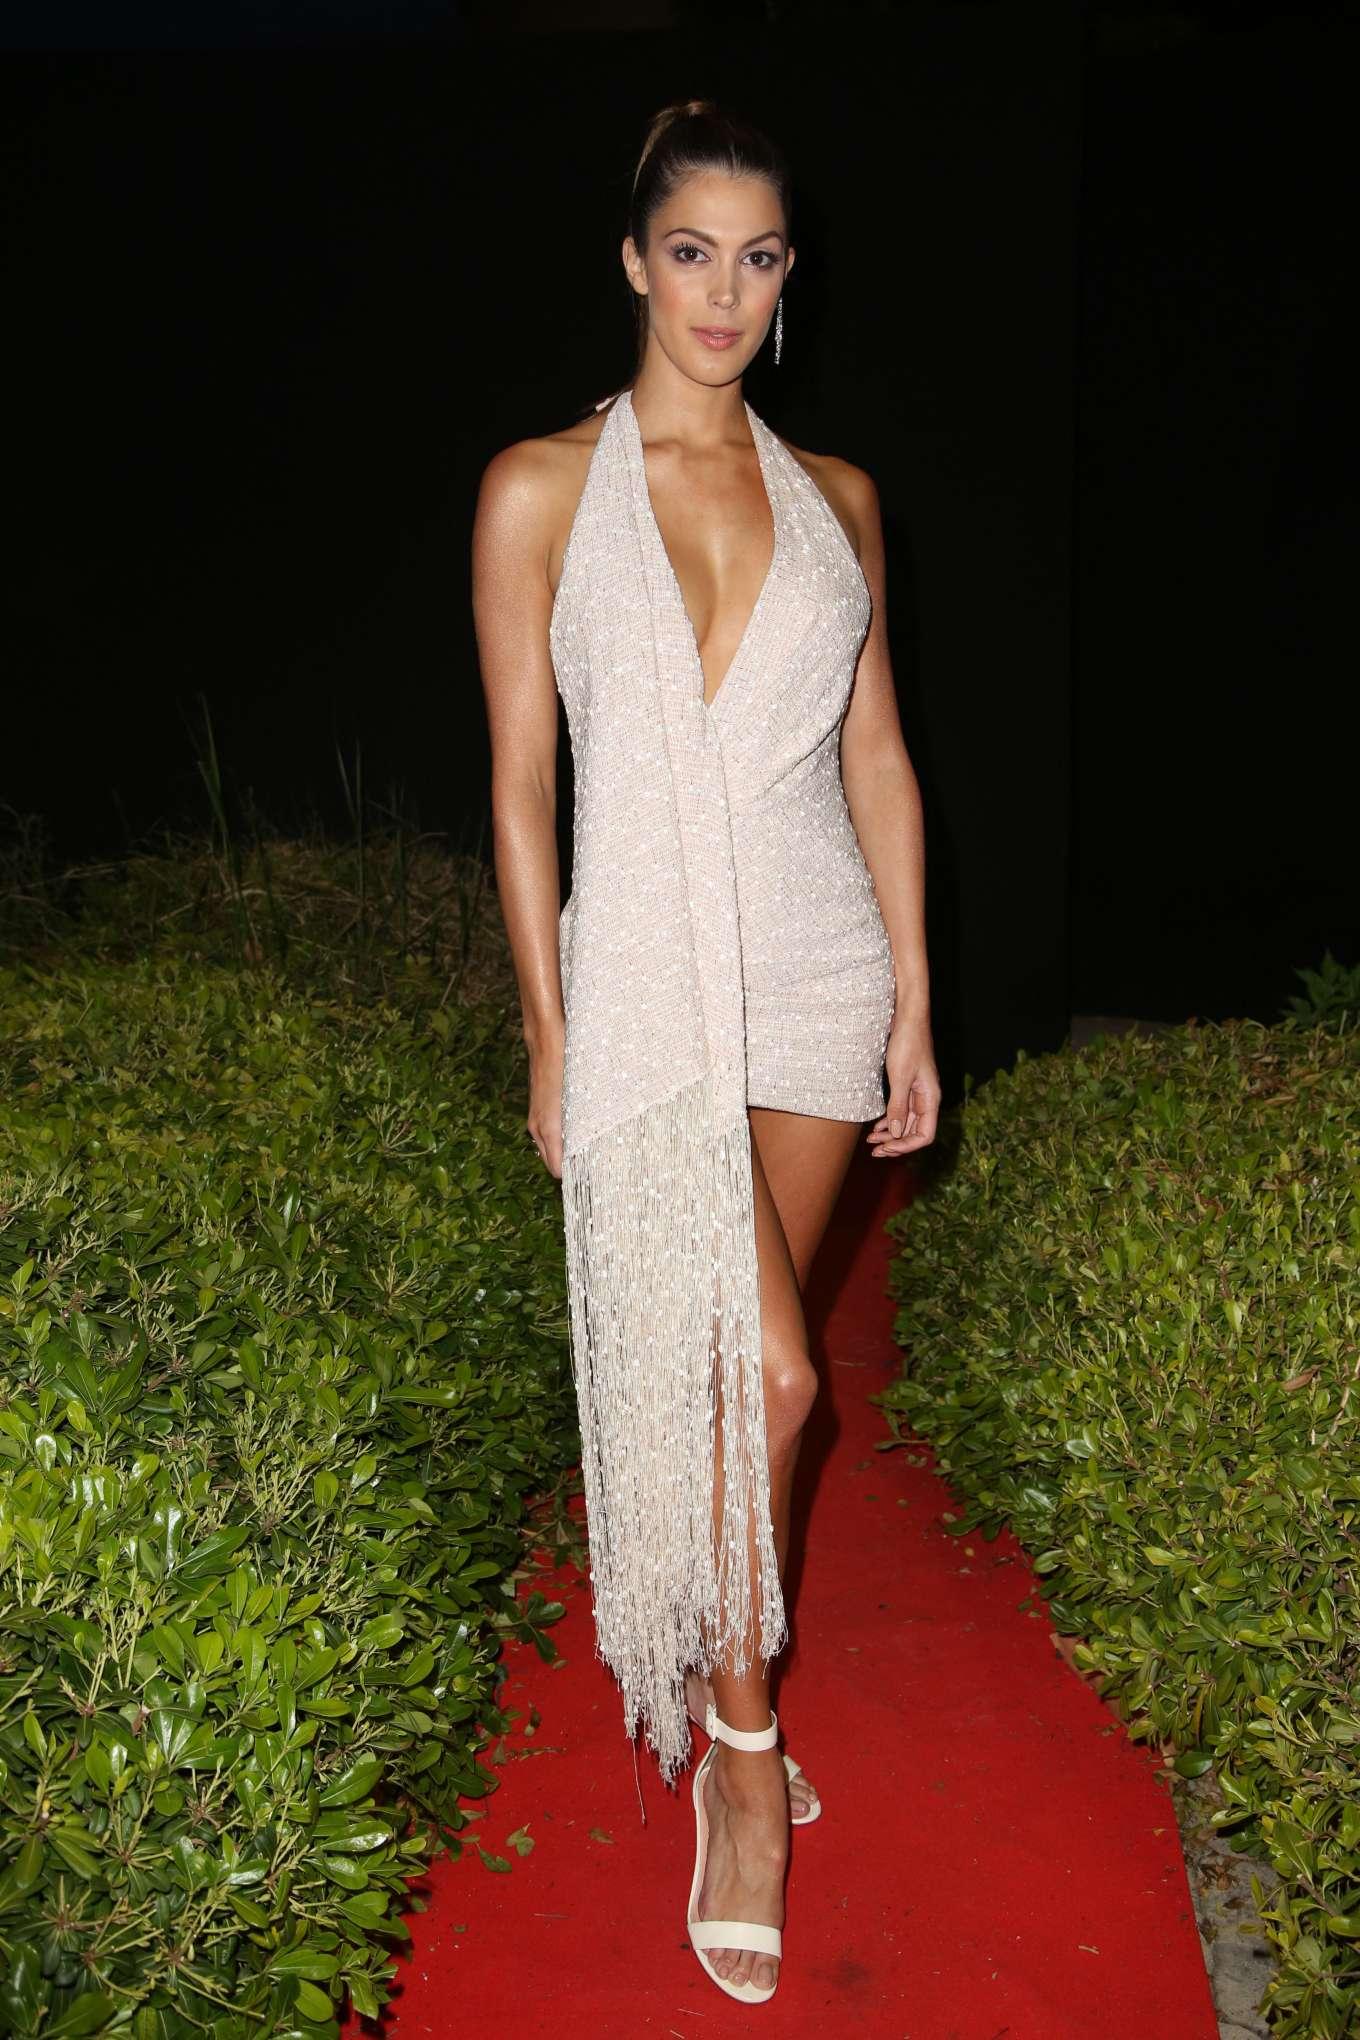 Iris Mittenaere 2019 : Iris Mittenaere at Villa AH in Cannes-04